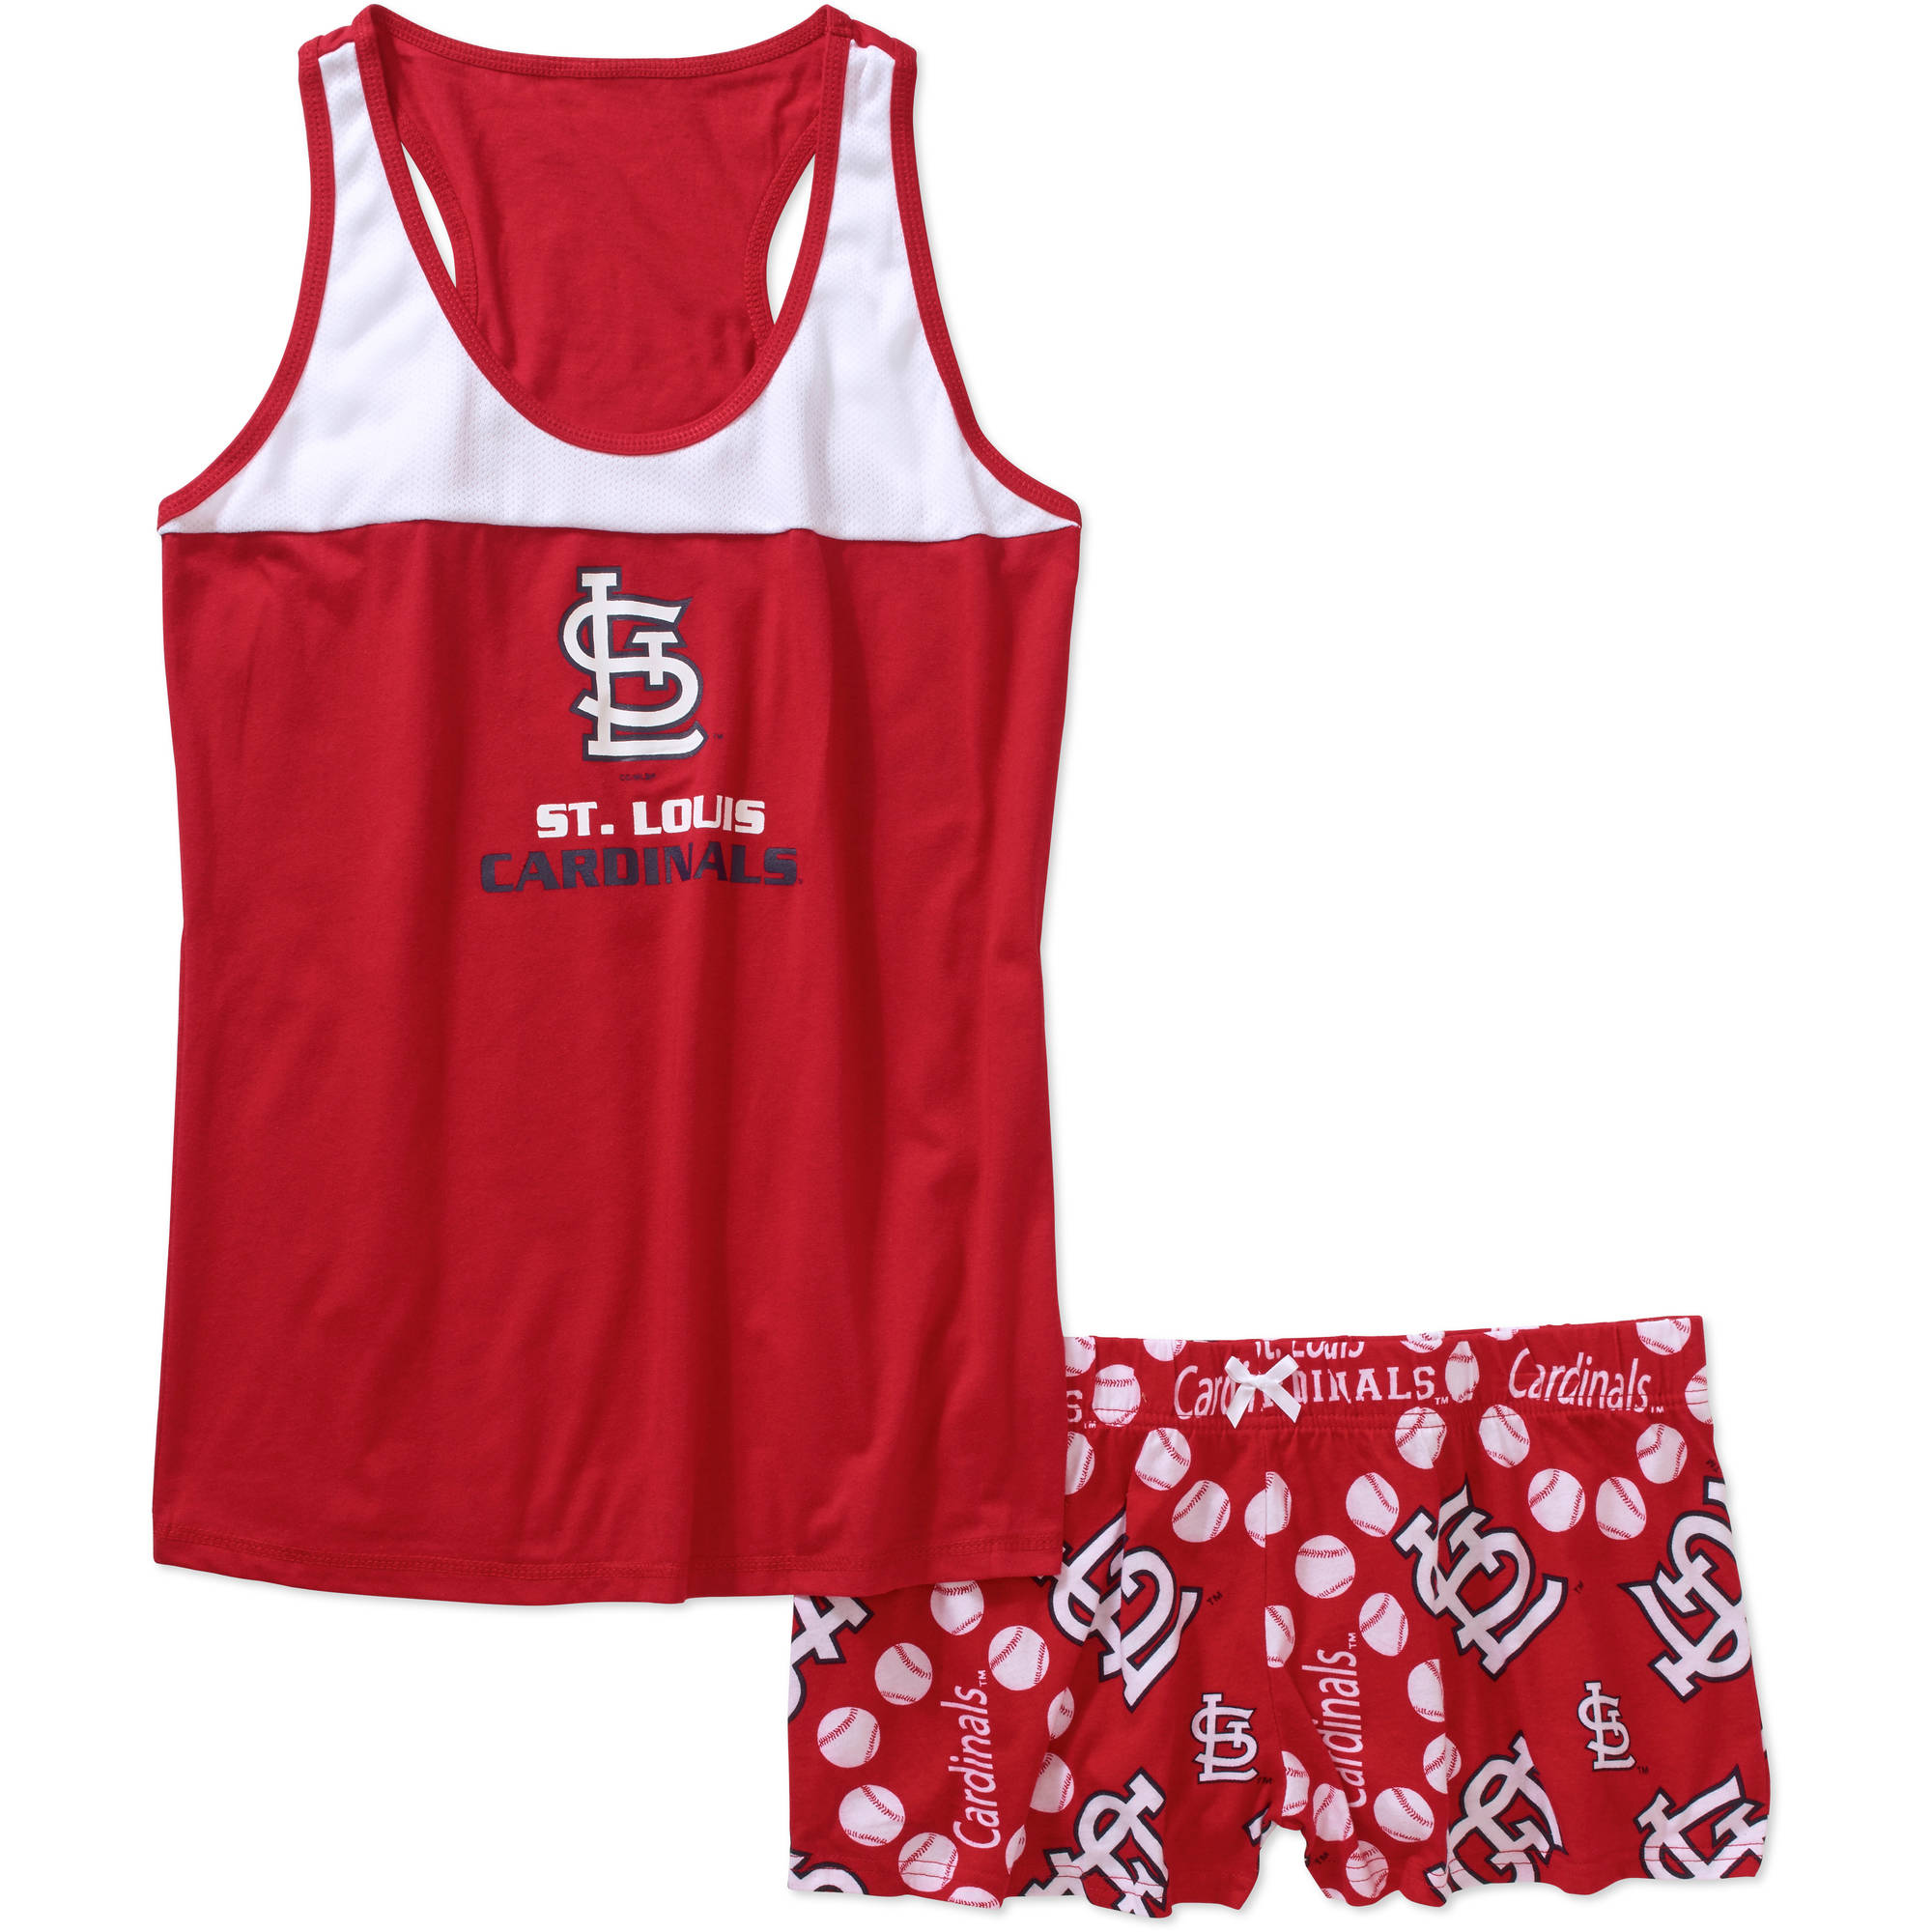 MLB Women's St. Louis Cardinals Tank Top and Shorts Set